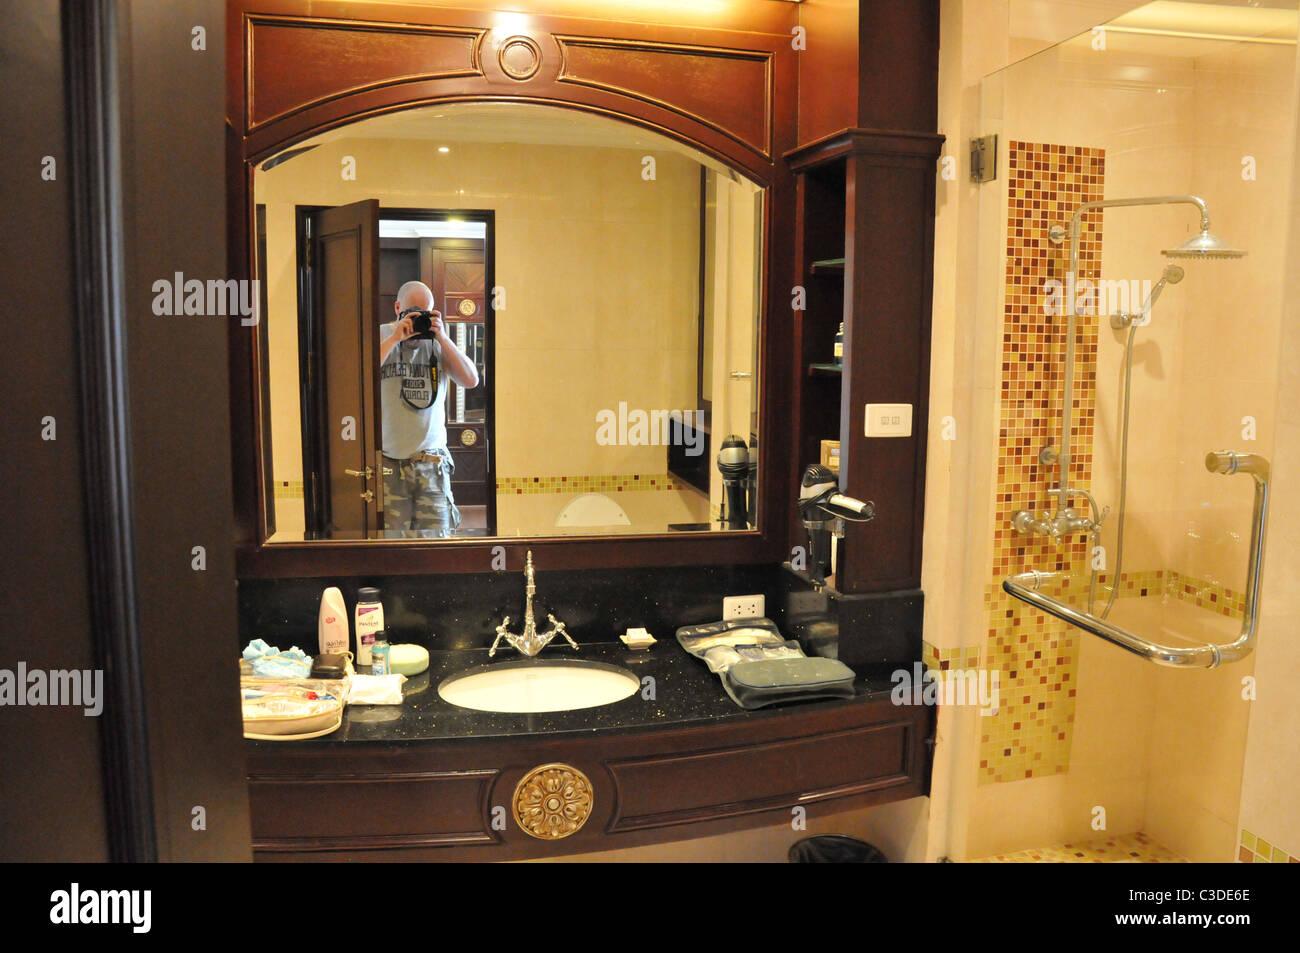 Pattaya Lk Renaissance Hotel Stock Photo 36561238 Alamy